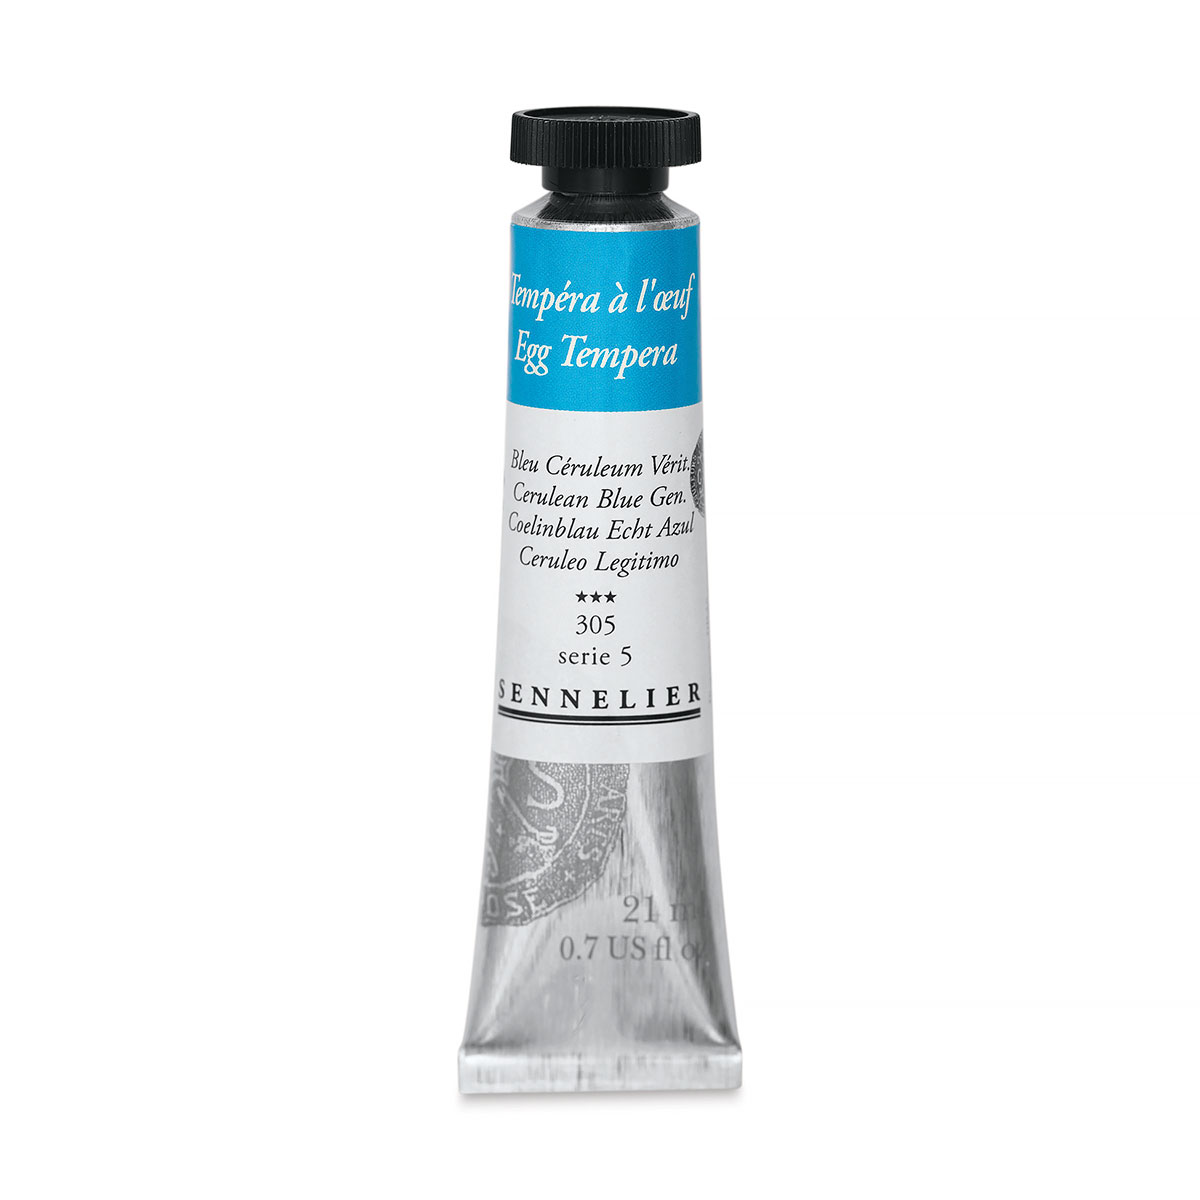 Sennelier Artists Egg Tempera - Cerulean Blue Genuine, 21 ml tube